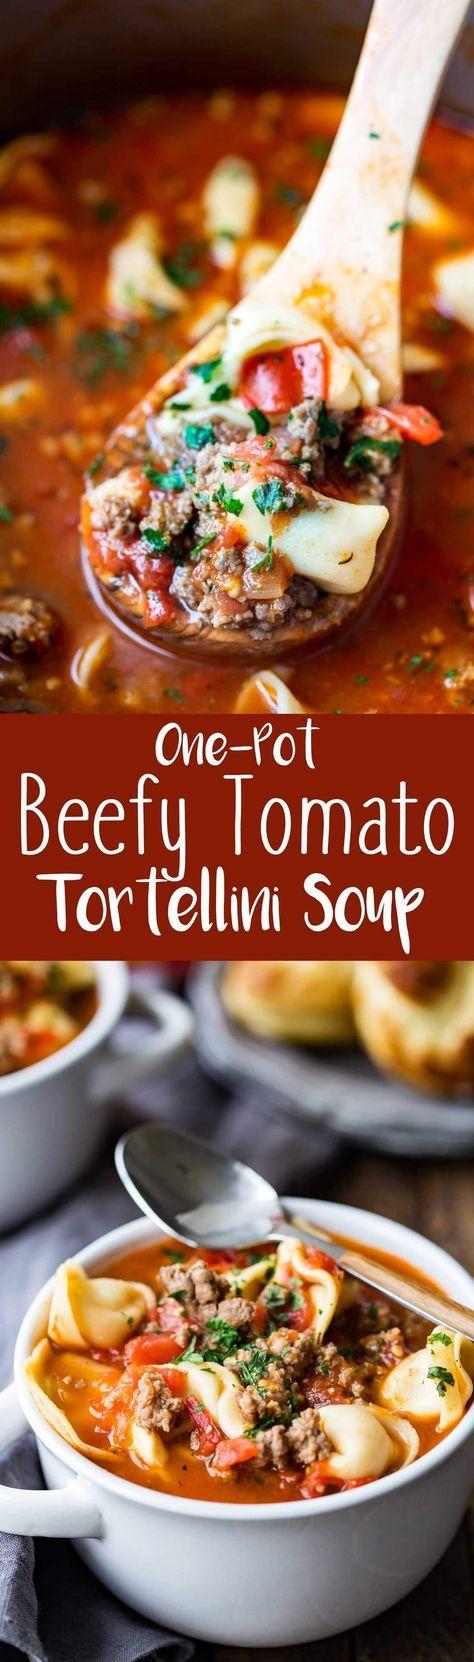 One Pot Beefy Tomato Tortellini Soup